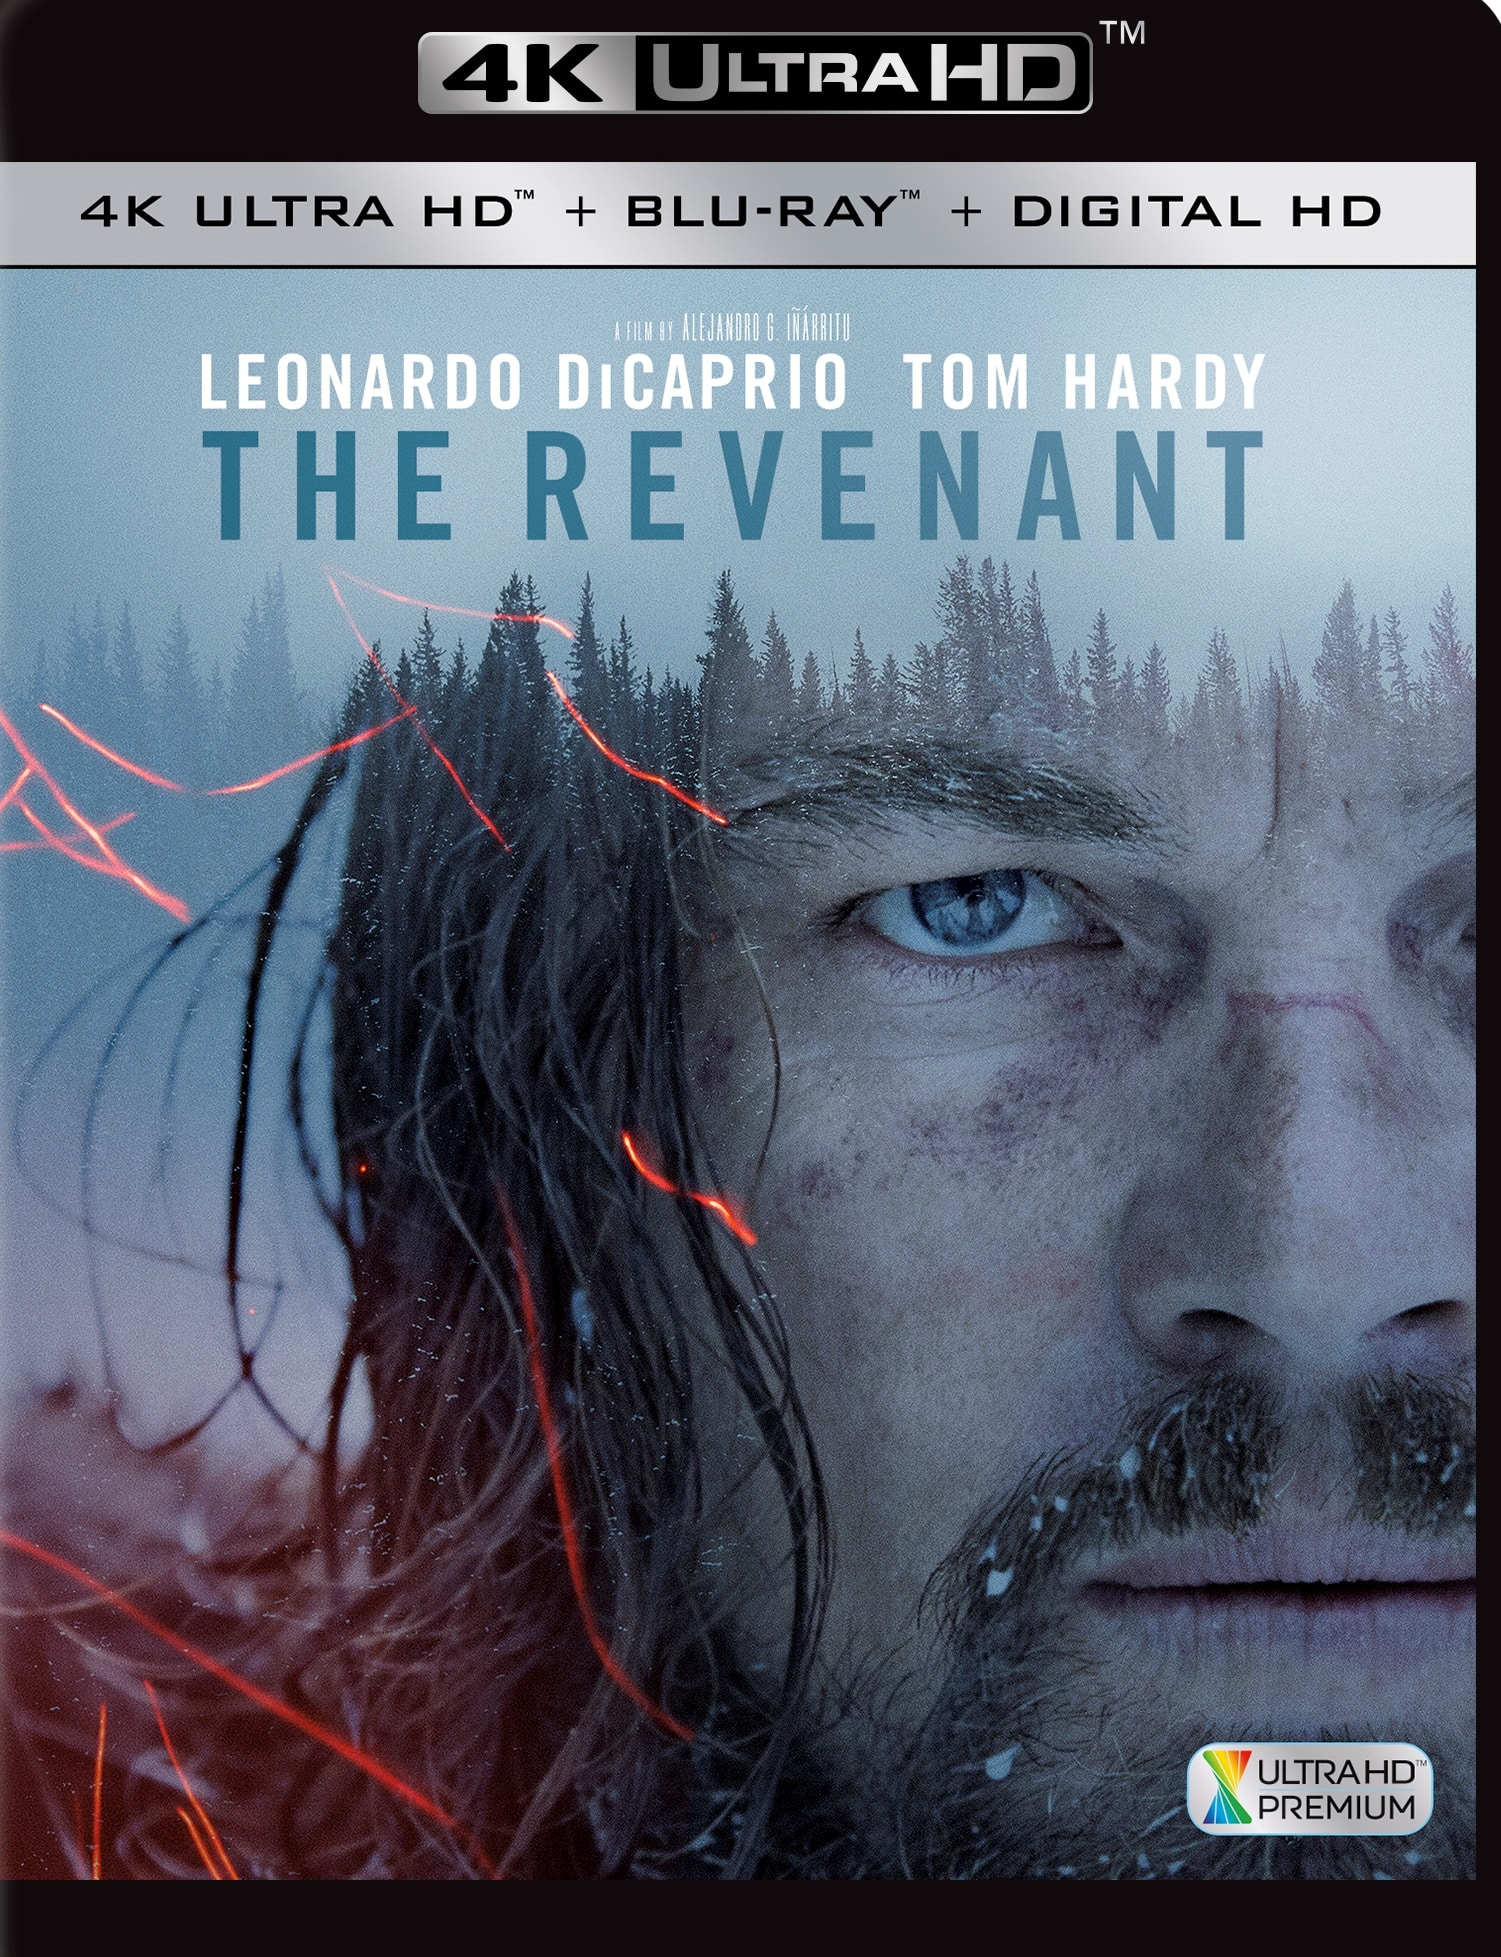 The Revenant [Includes Digital Copy] [4K Ultra HD Blu-ray/Blu-ray] [2015] - Best Buy $13.99